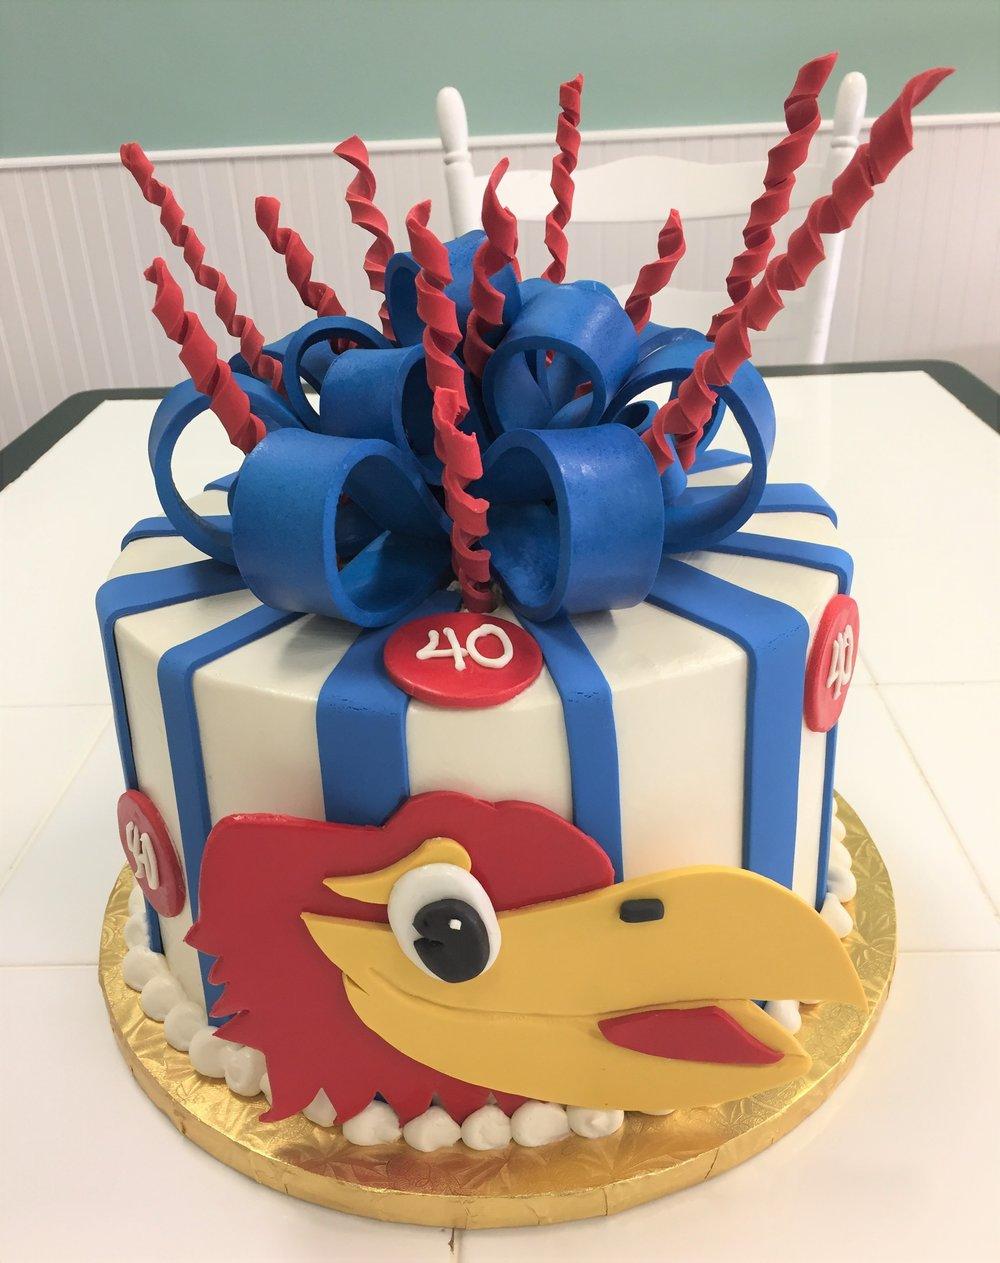 jayhawk grad cake.jpg